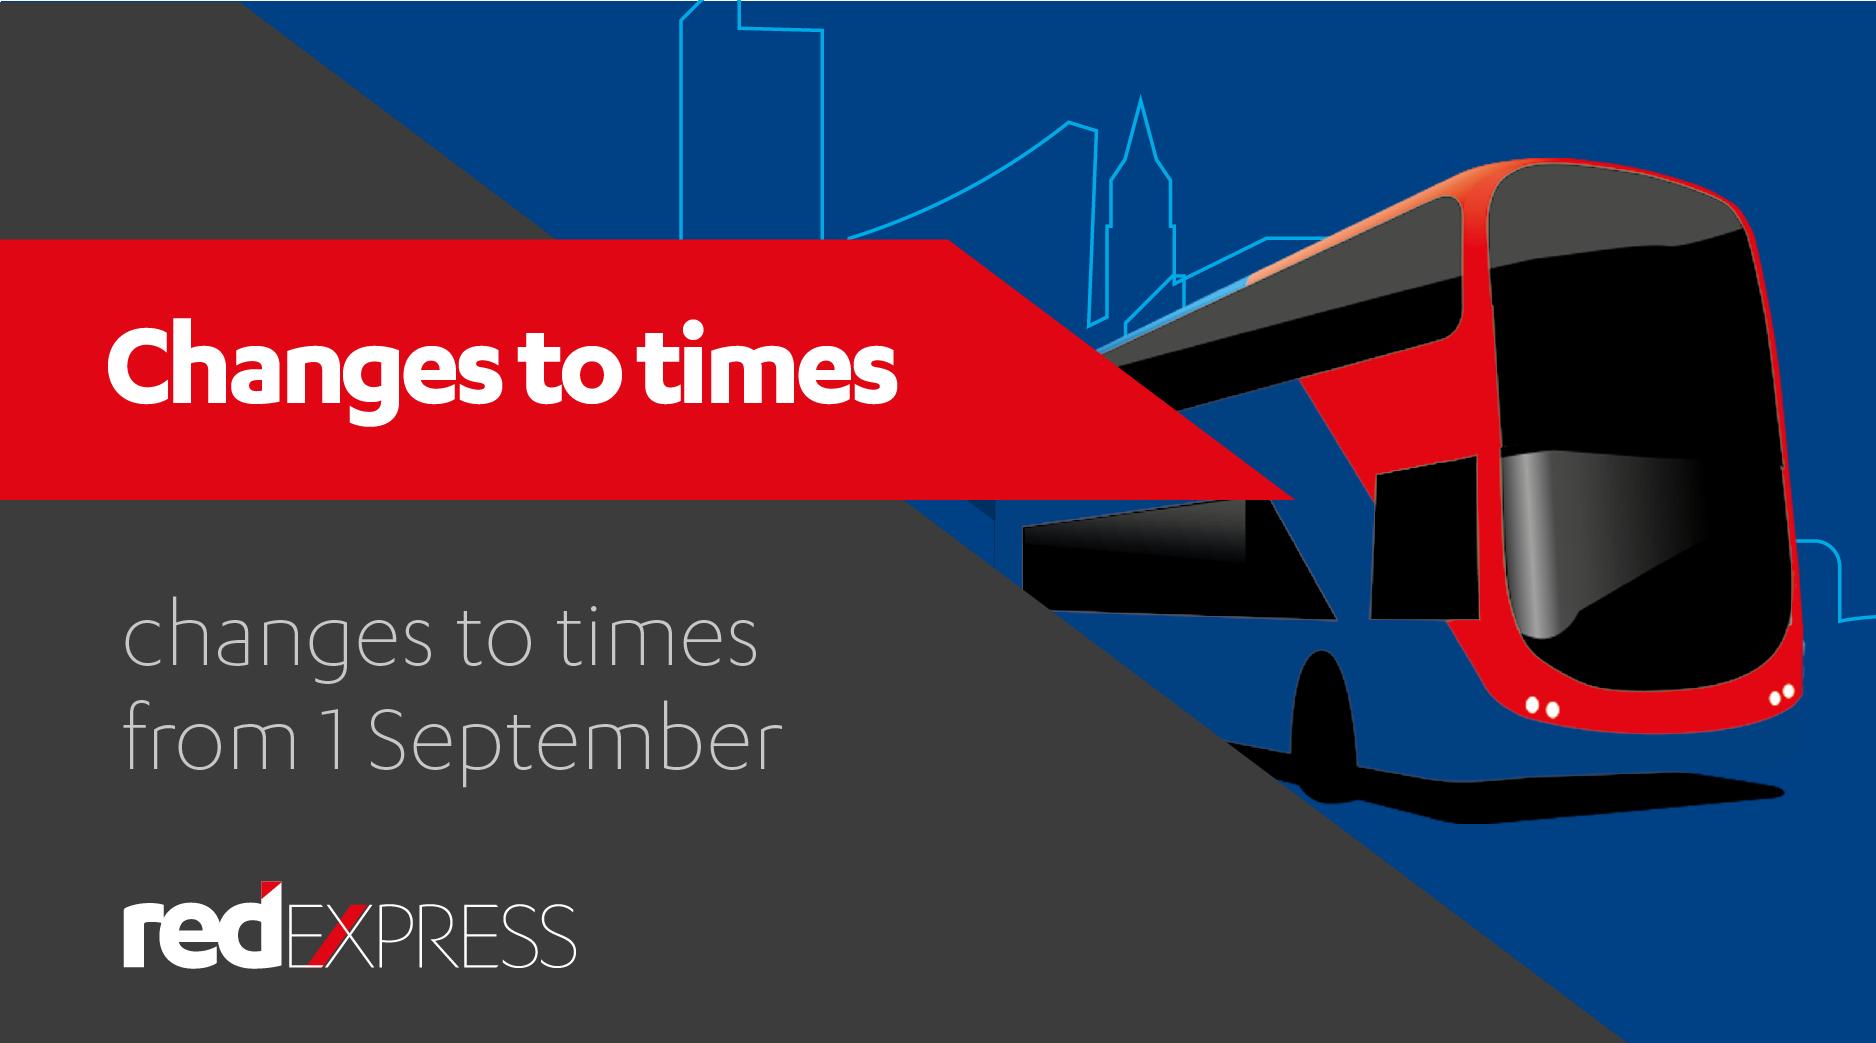 Red Express 1 September